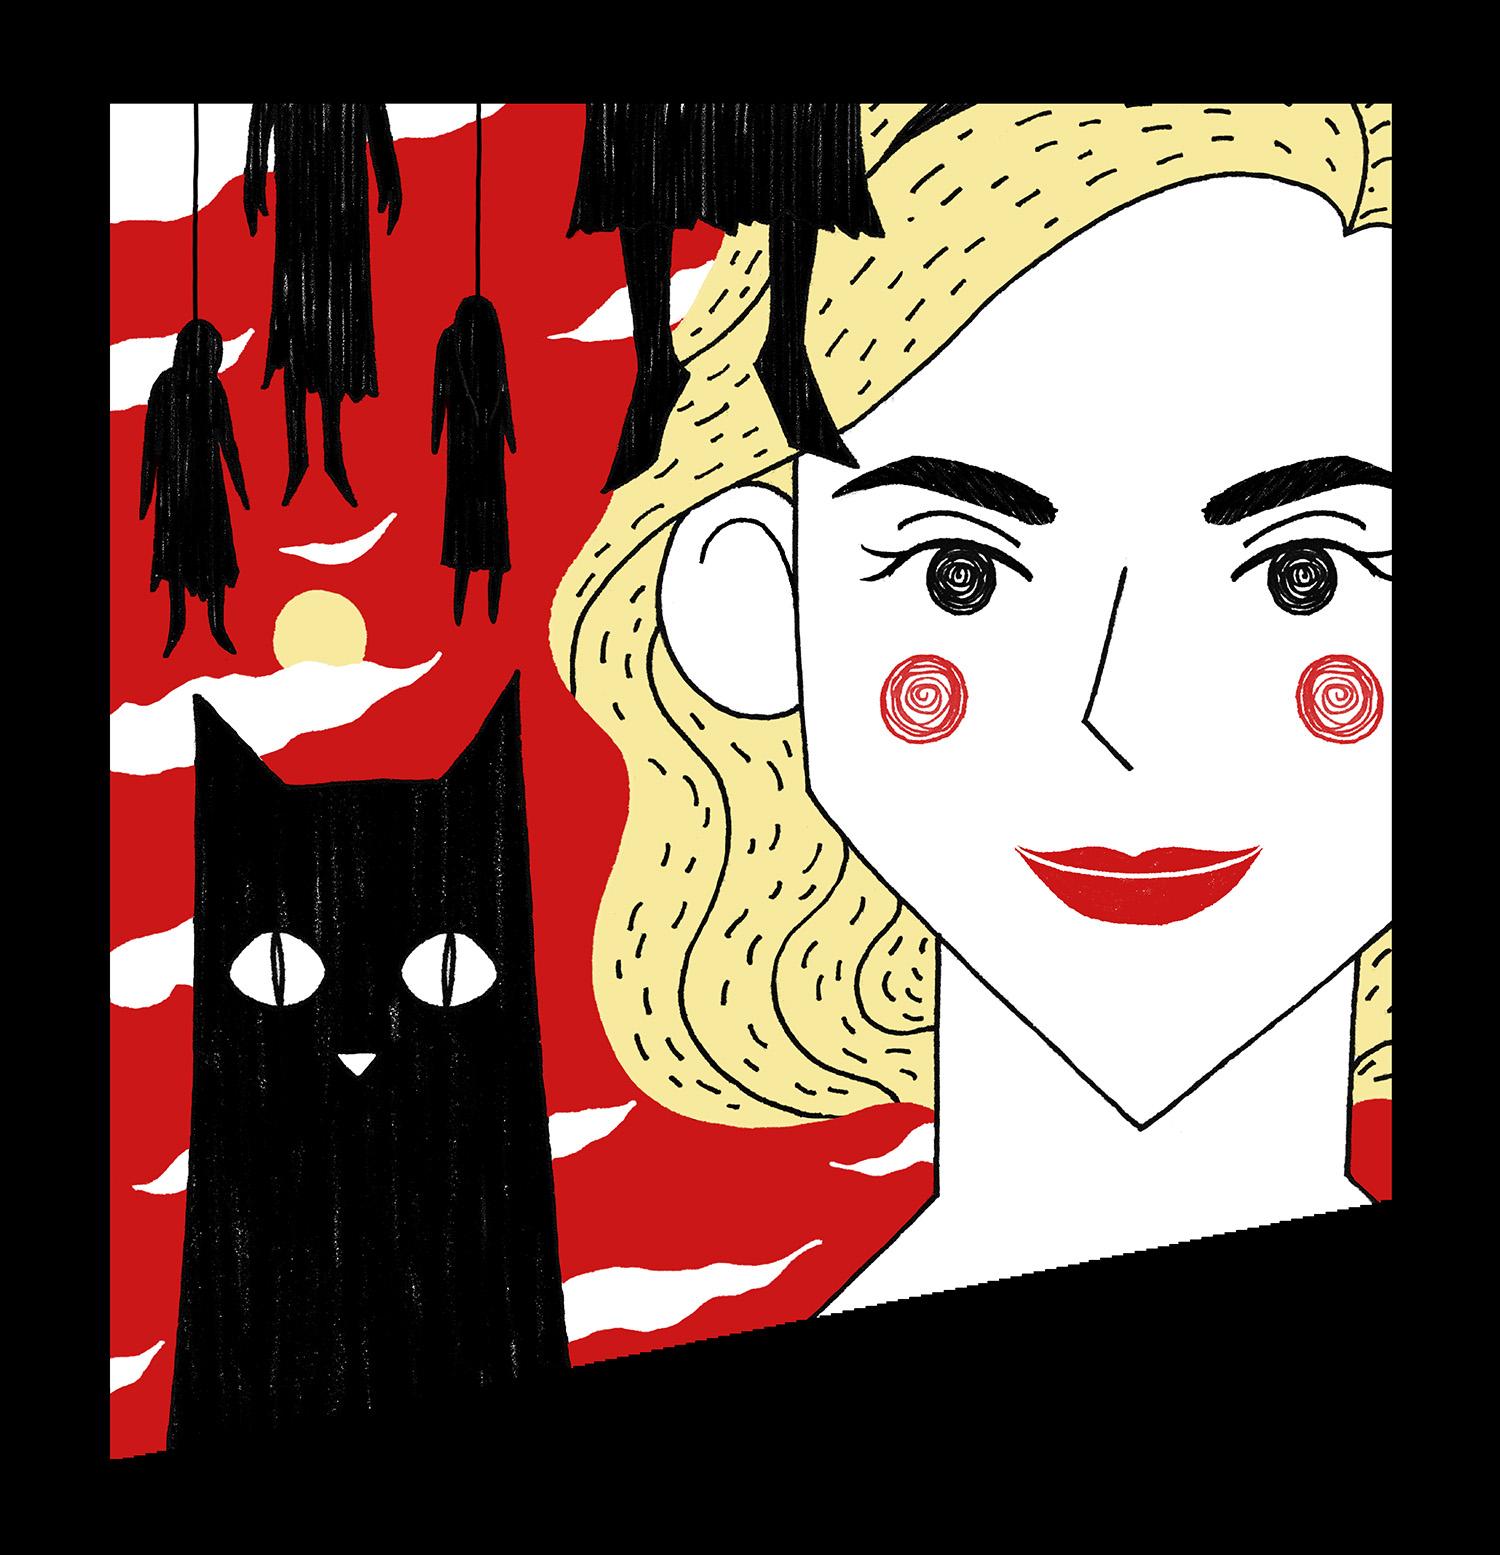 MINI-SYS.COM Shirley Susilo sabrina nes nintendo illustration.jpg